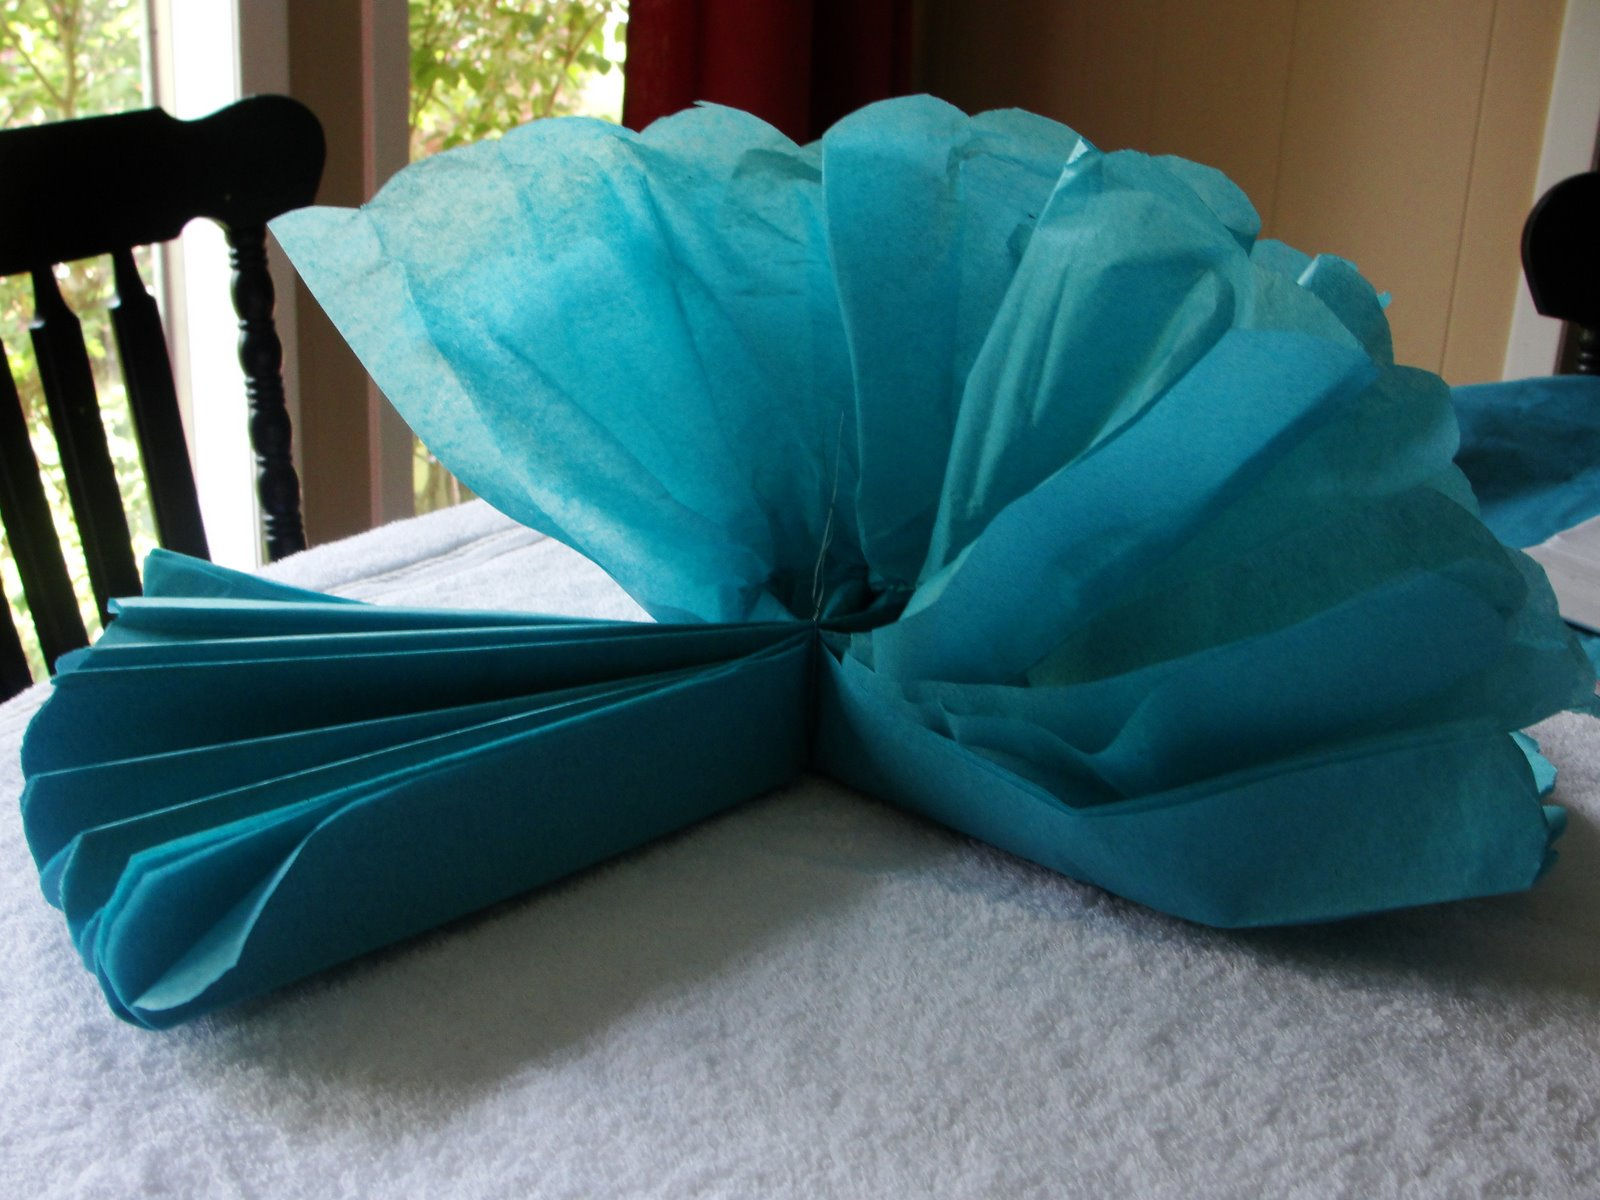 sweetpea 39 s how to make tissue paper pompoms. Black Bedroom Furniture Sets. Home Design Ideas